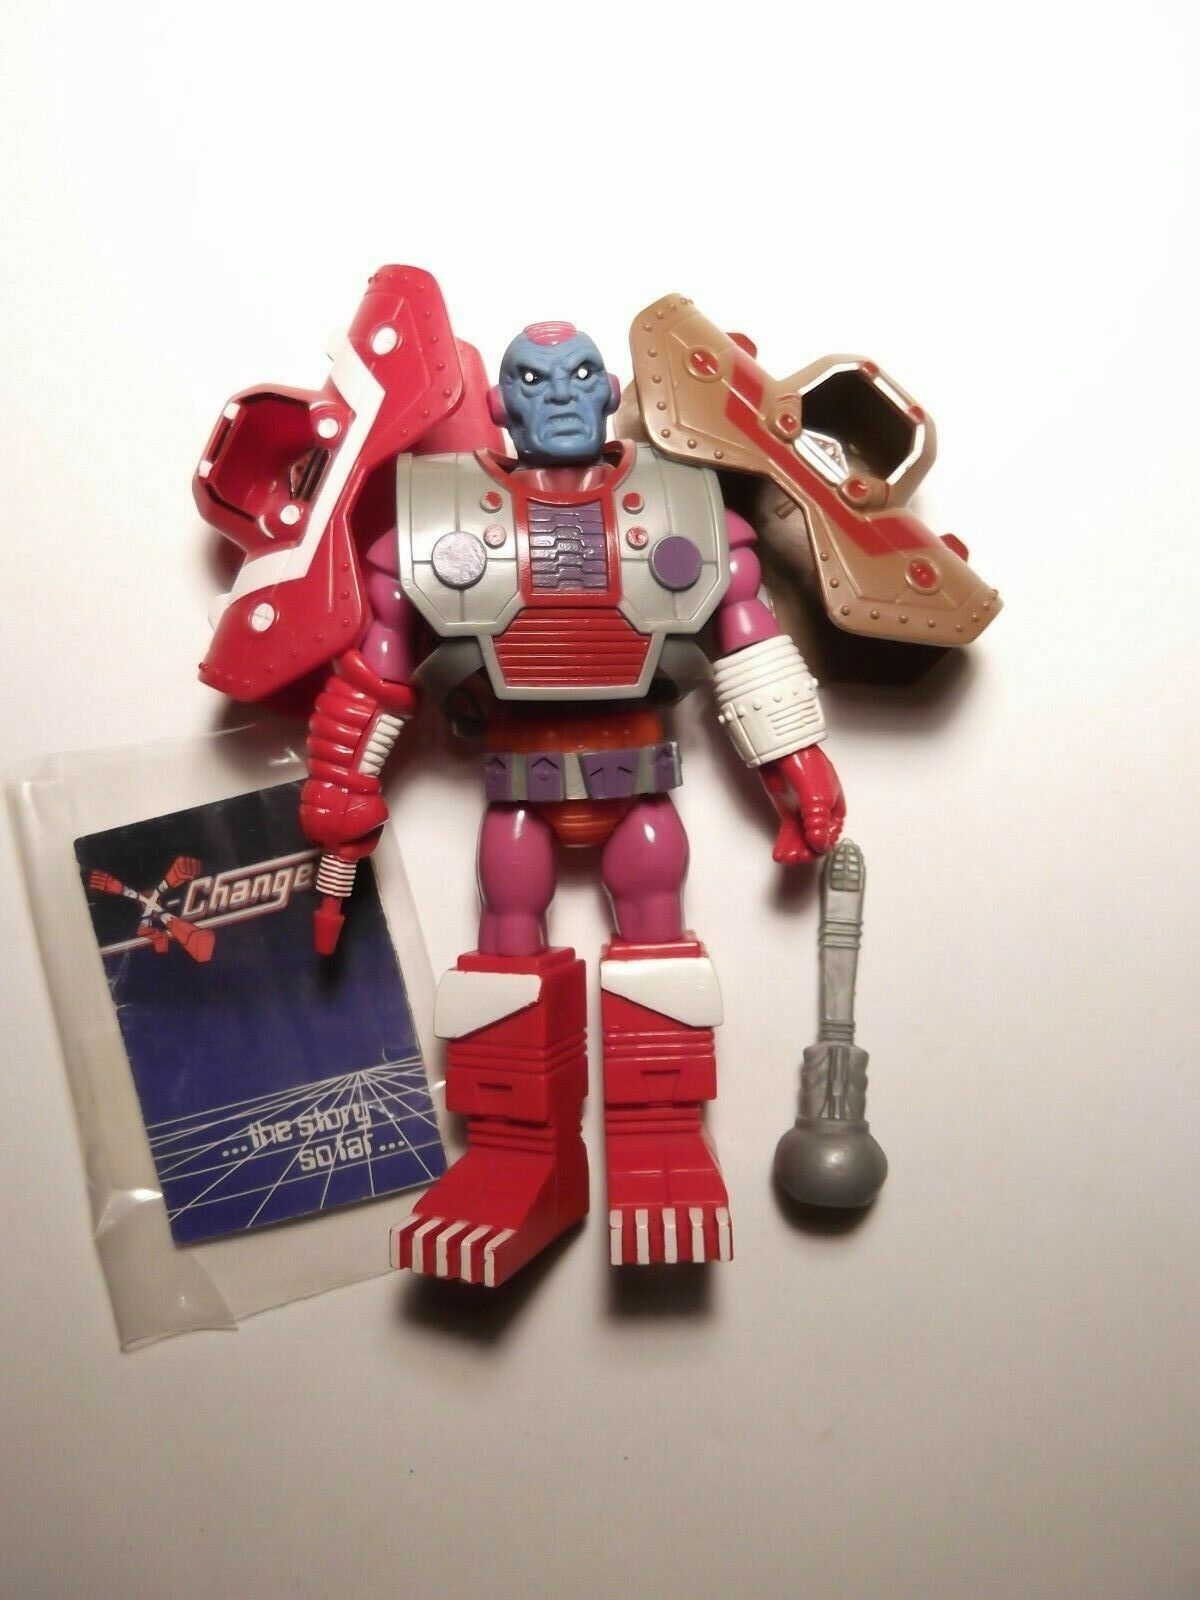 Acamas giocattoli X-Changers Terax cifra  completare Bonus armor-helmet  galaxy warriors  molte sorprese